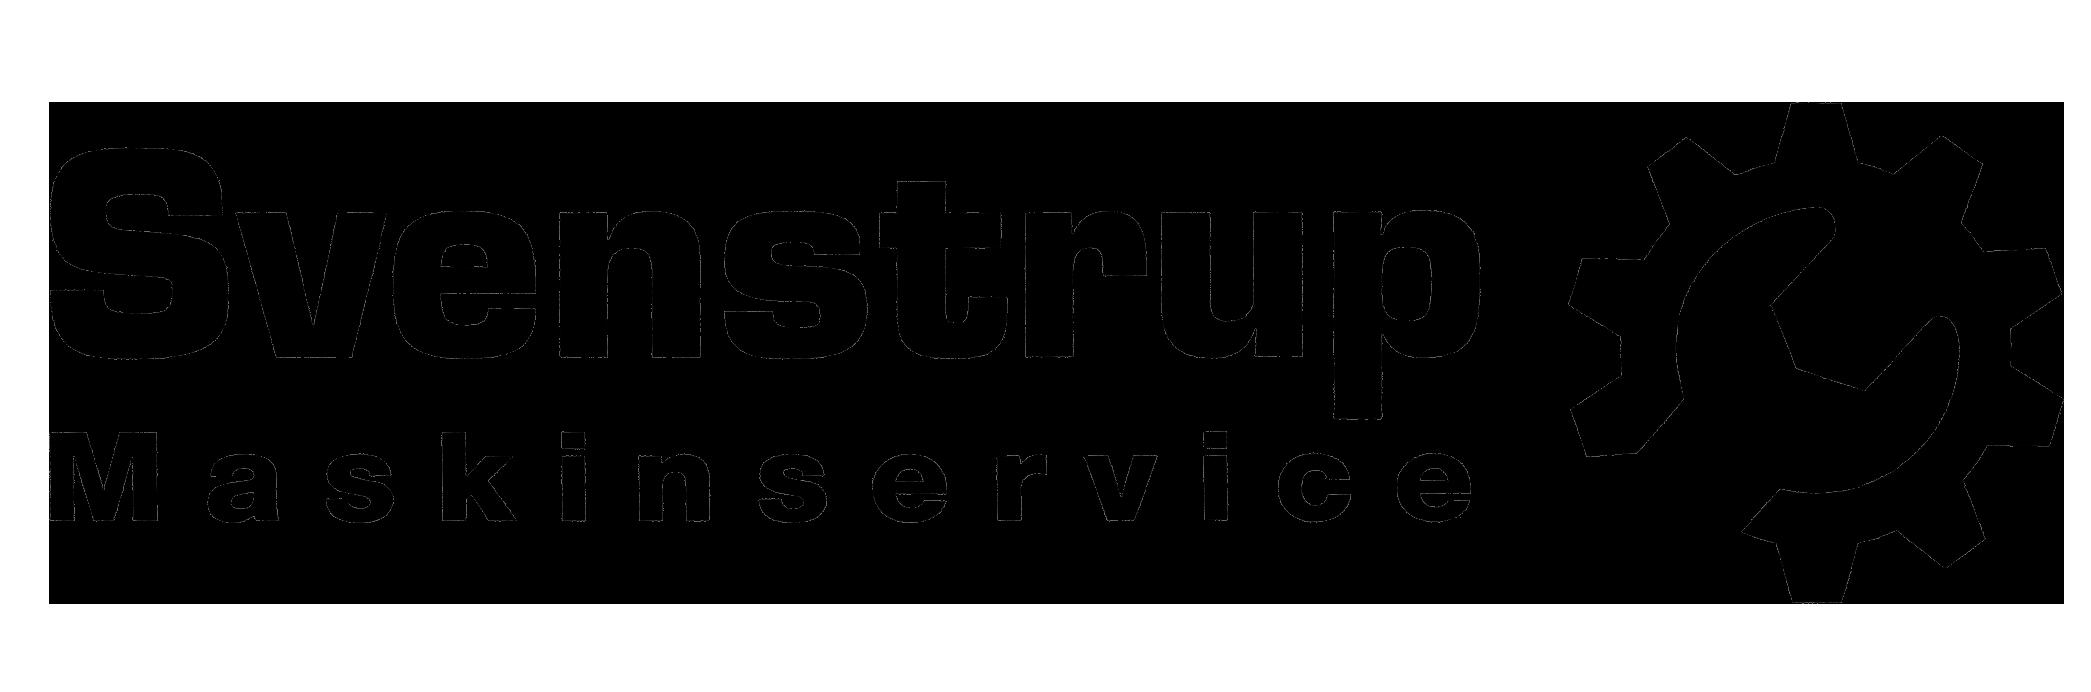 Svenstrup Logo